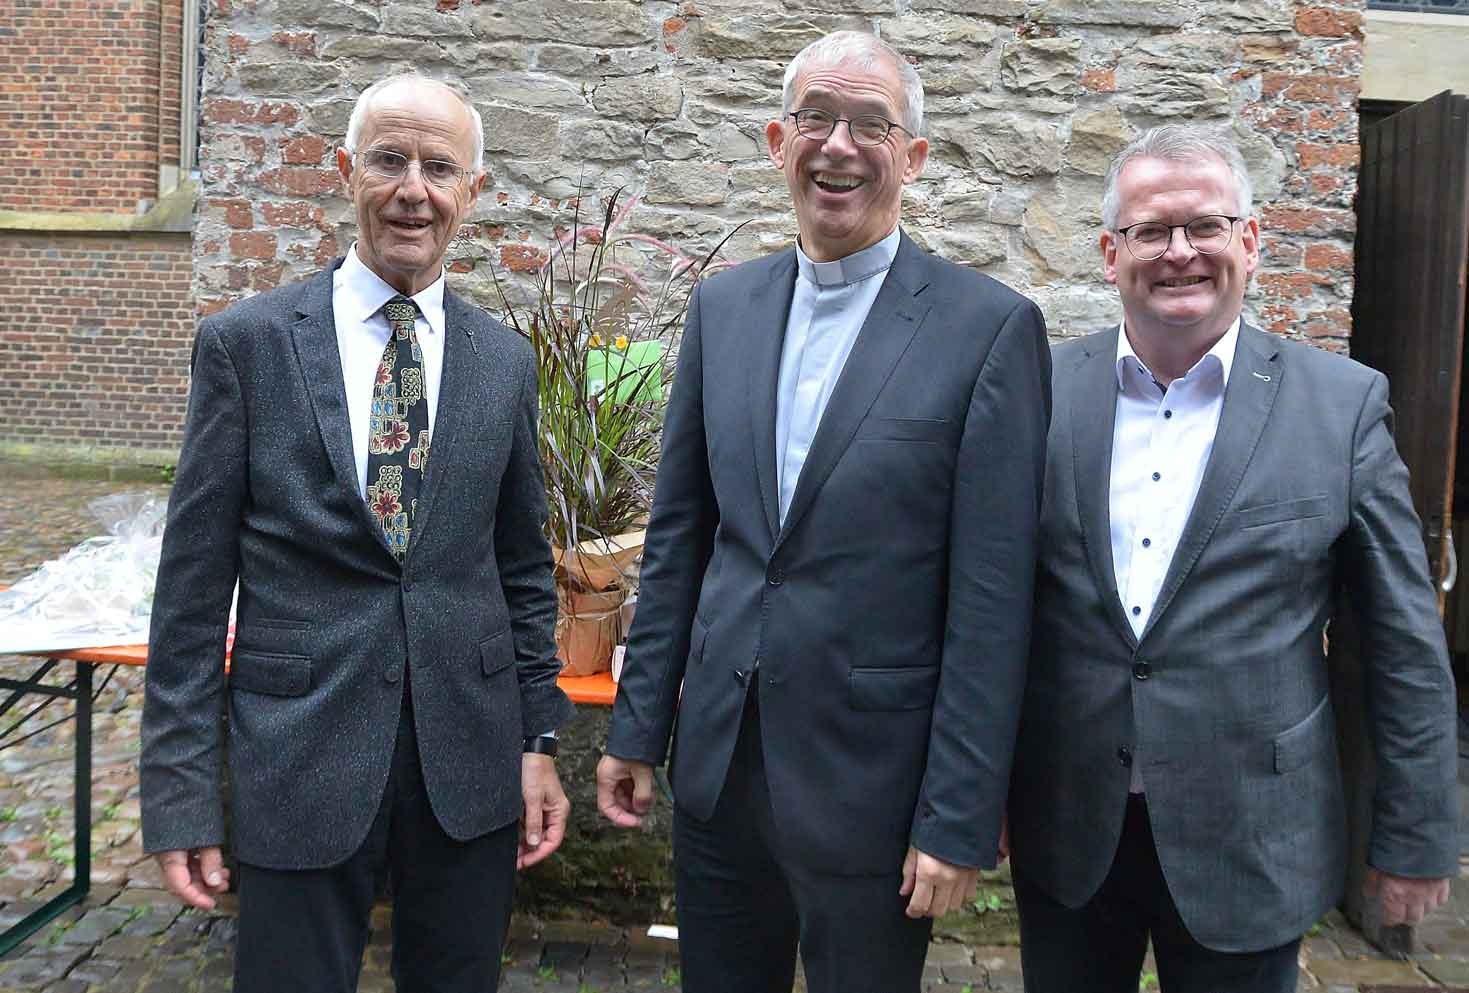 Michael-Kenkel-Georg-Badurczyk-und-Martin-Tesing-Raesfeld